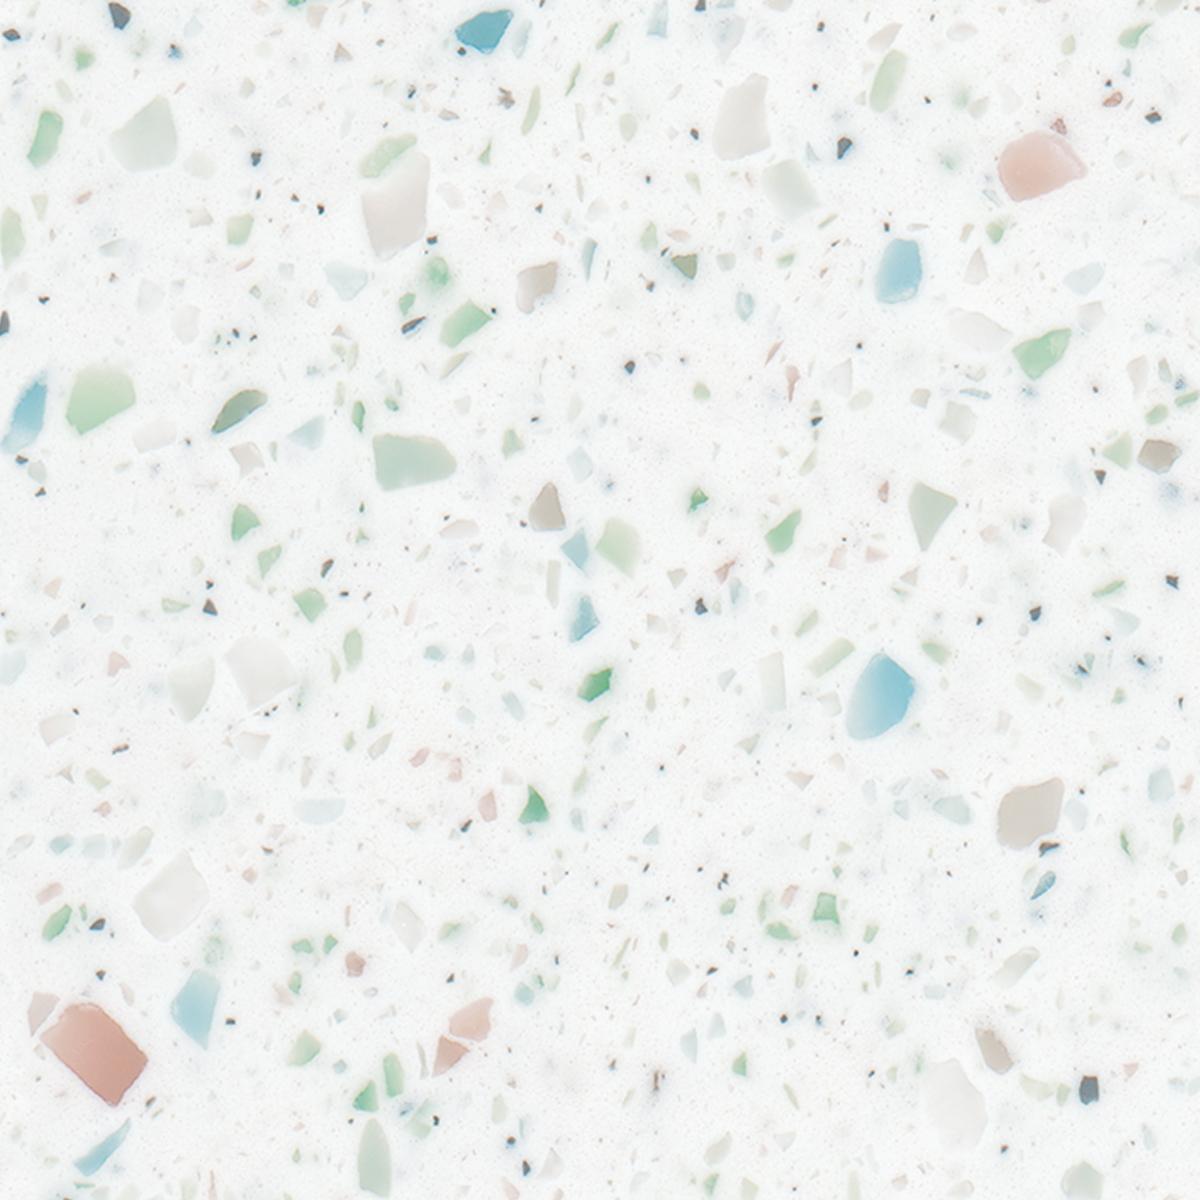 505 Sea Gl Laminate Countertops